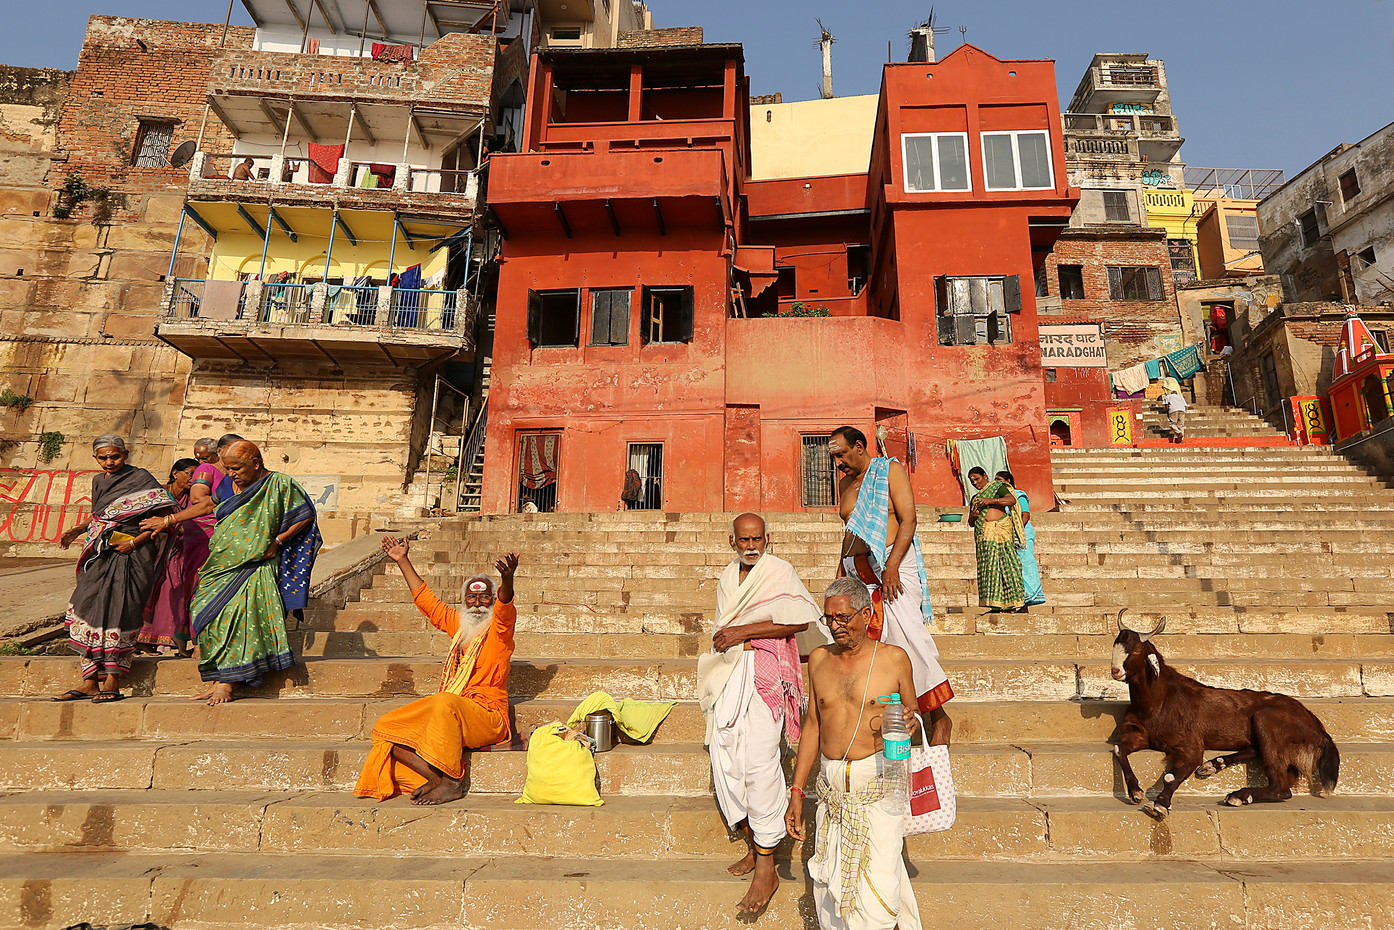 Sadhu, Hindu devotees & billy goat in Varanasi, India